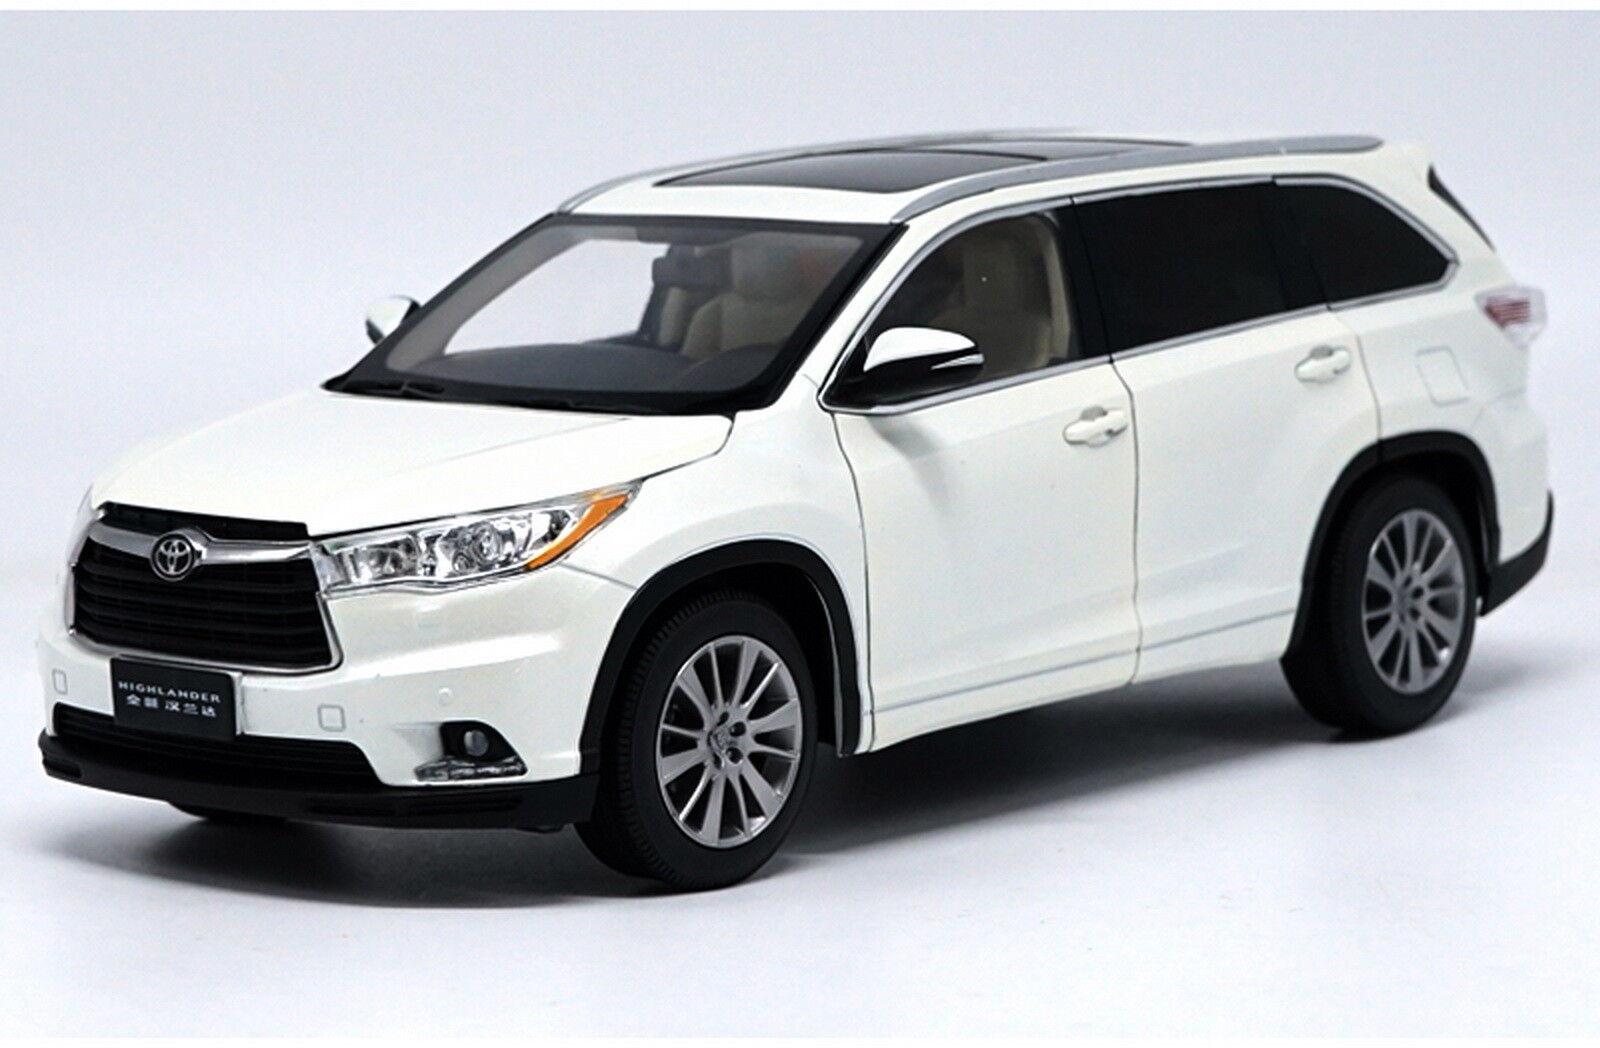 1 18 Scale Toyota Highlander 2015 White Diecast Car Model Dealer Edition